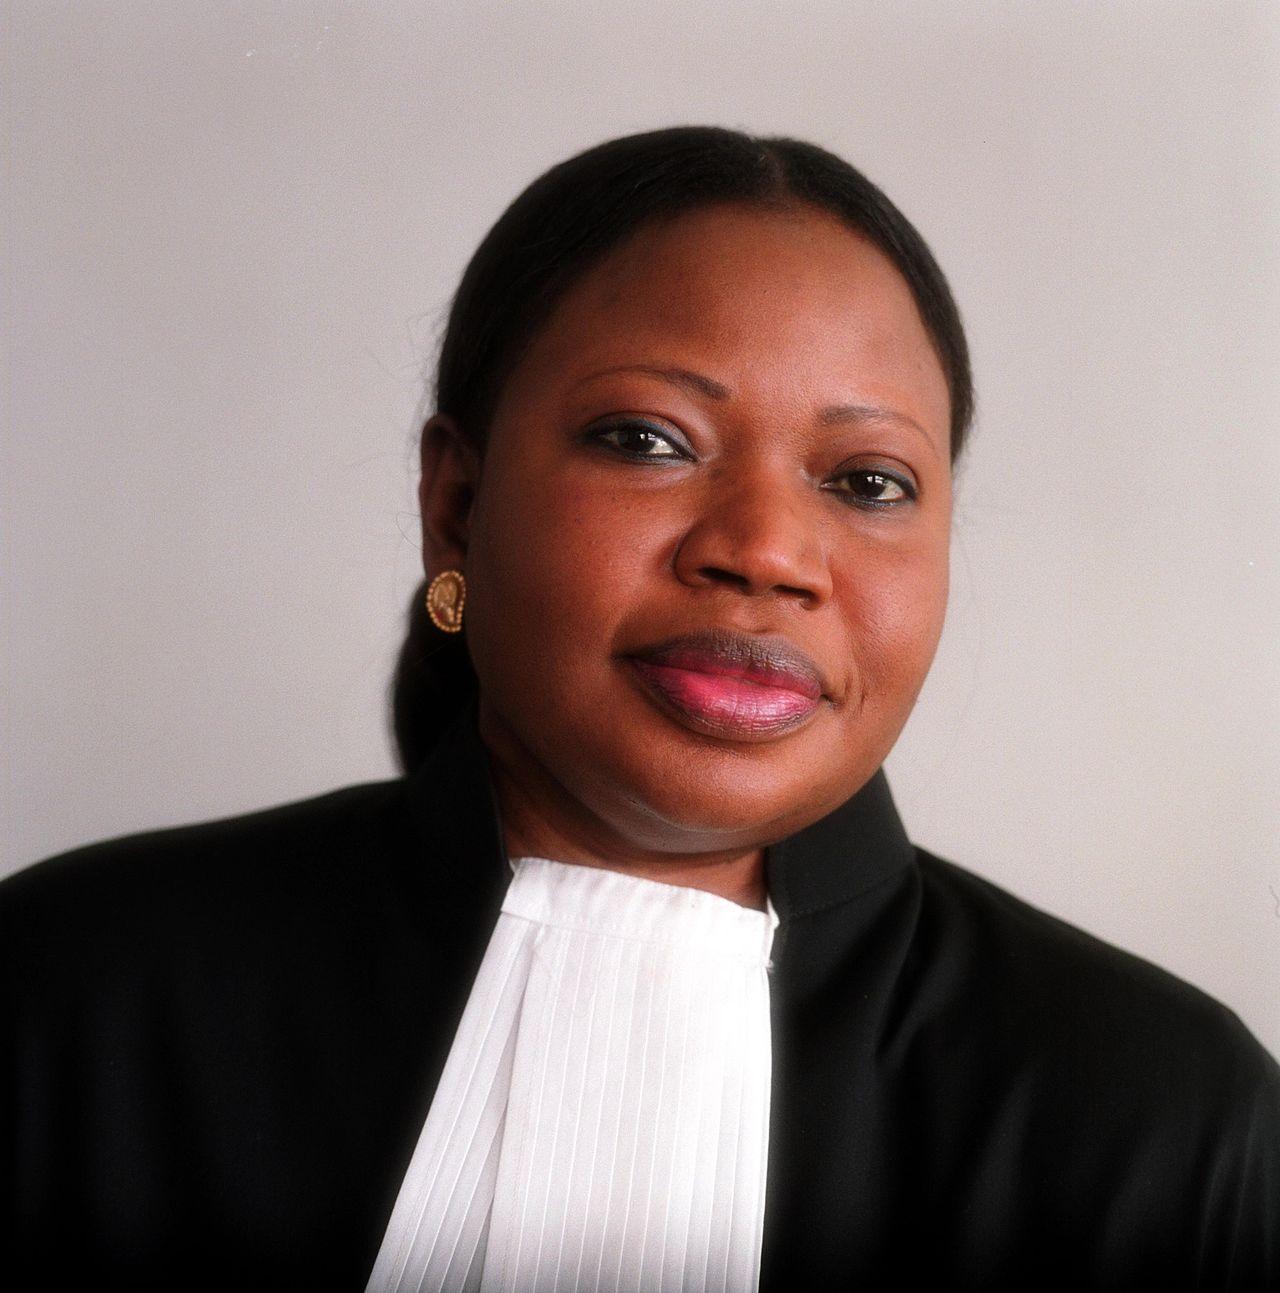 United States places sanctions on International Criminal Court prosecutor Bensouda